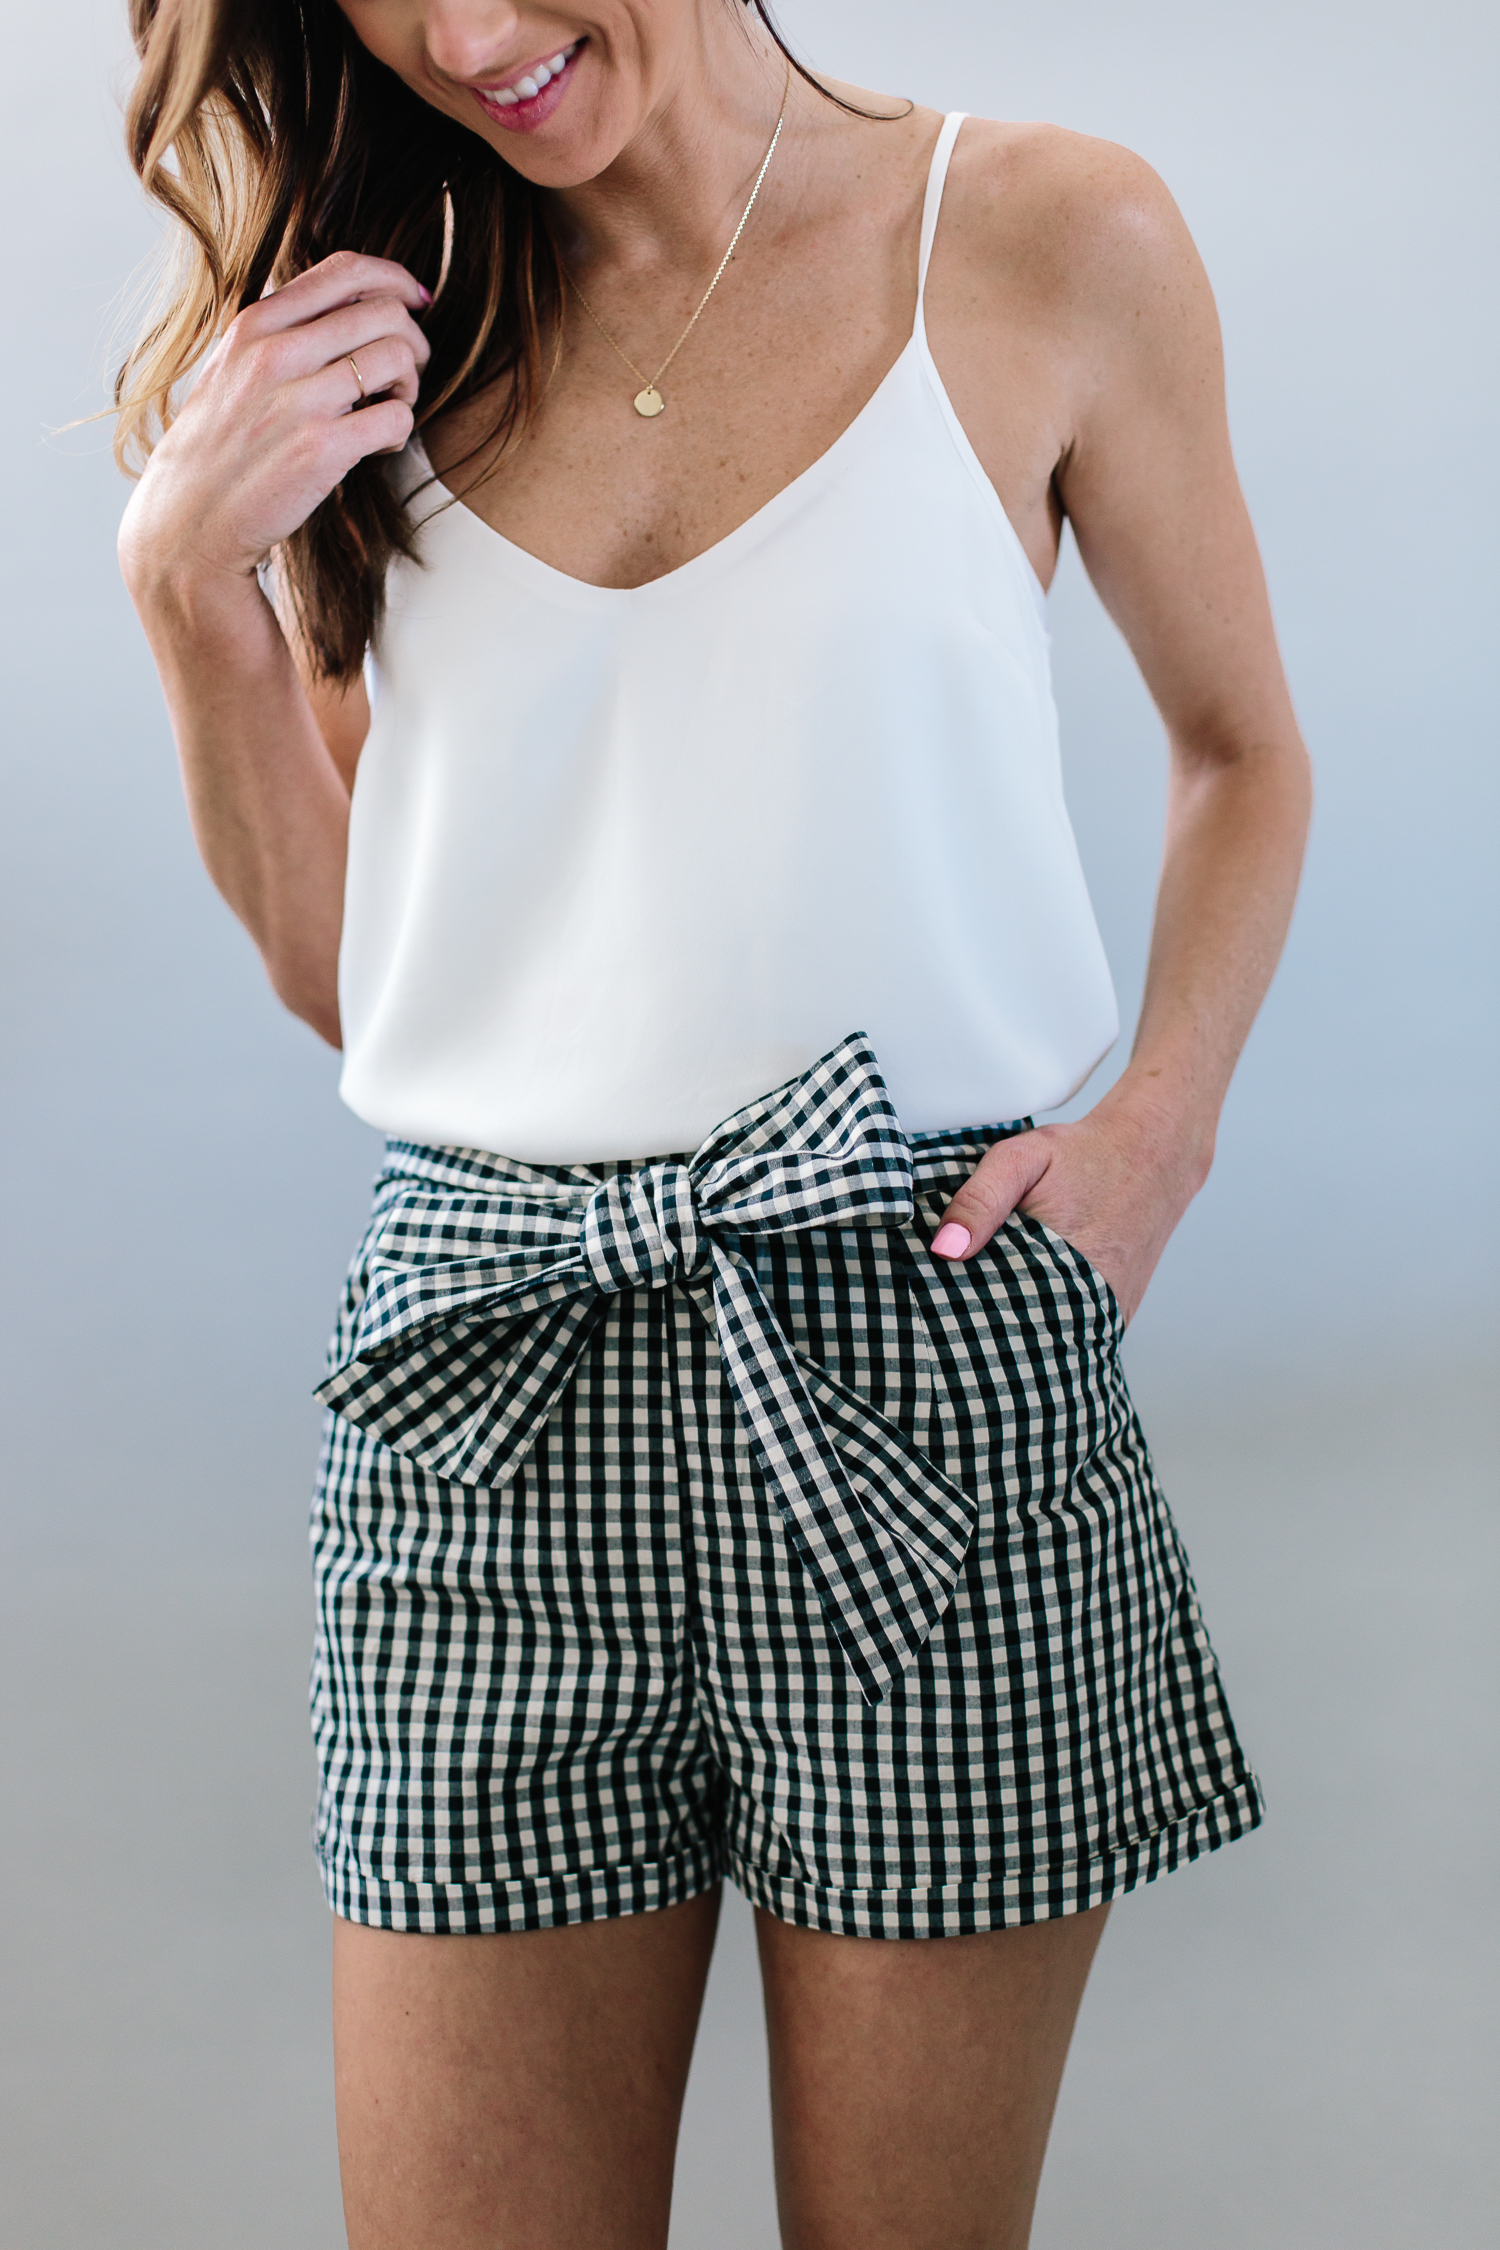 checkered shorts, gingham shorts, shorts review, statement earrings, spring shorts, summer shorts, shorts review, shorts